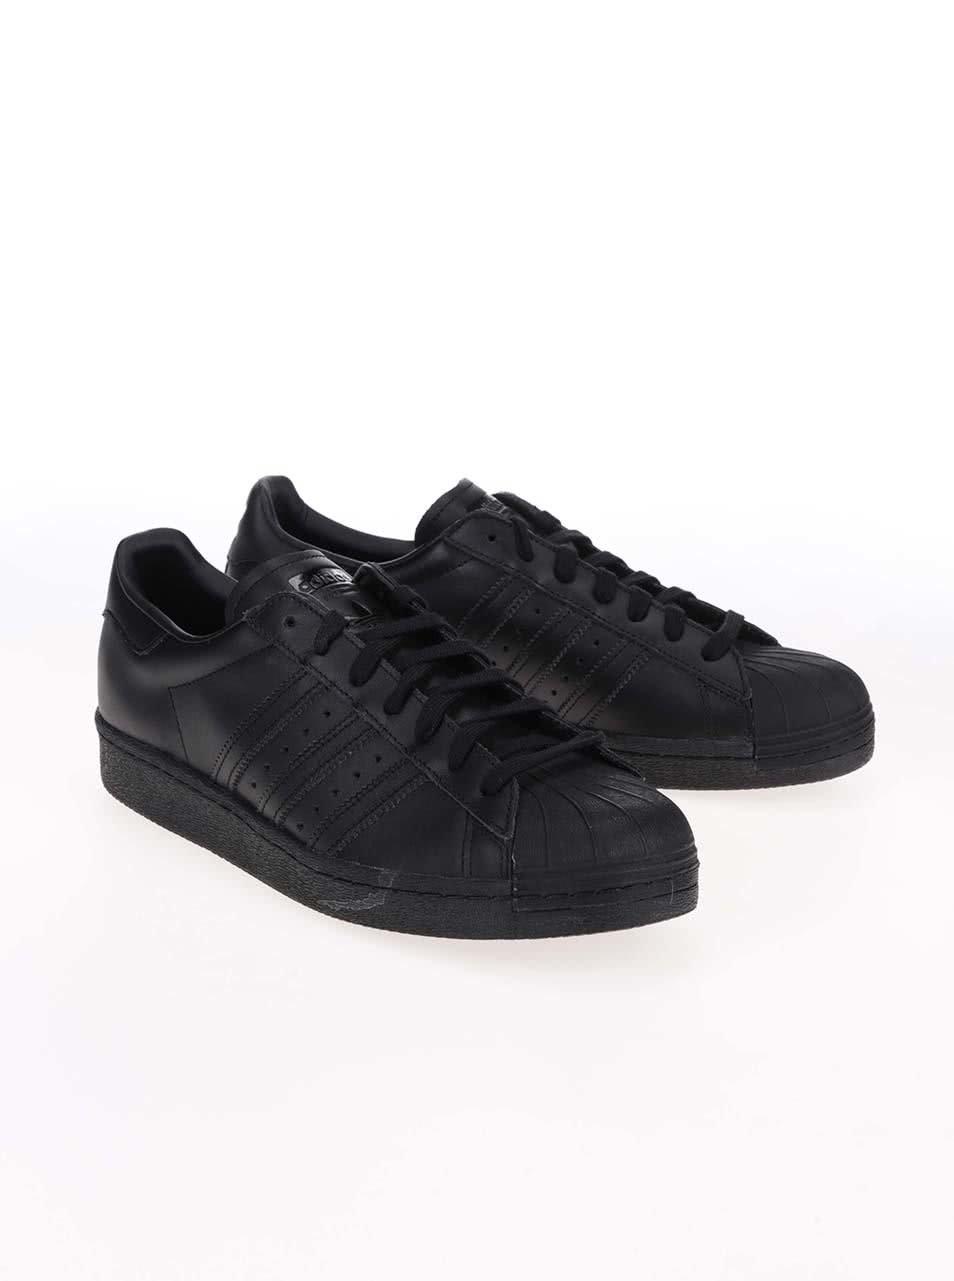 Čierne pánske kožené tenisky adidas Originals Superstar  80s ... 779326a7a5f